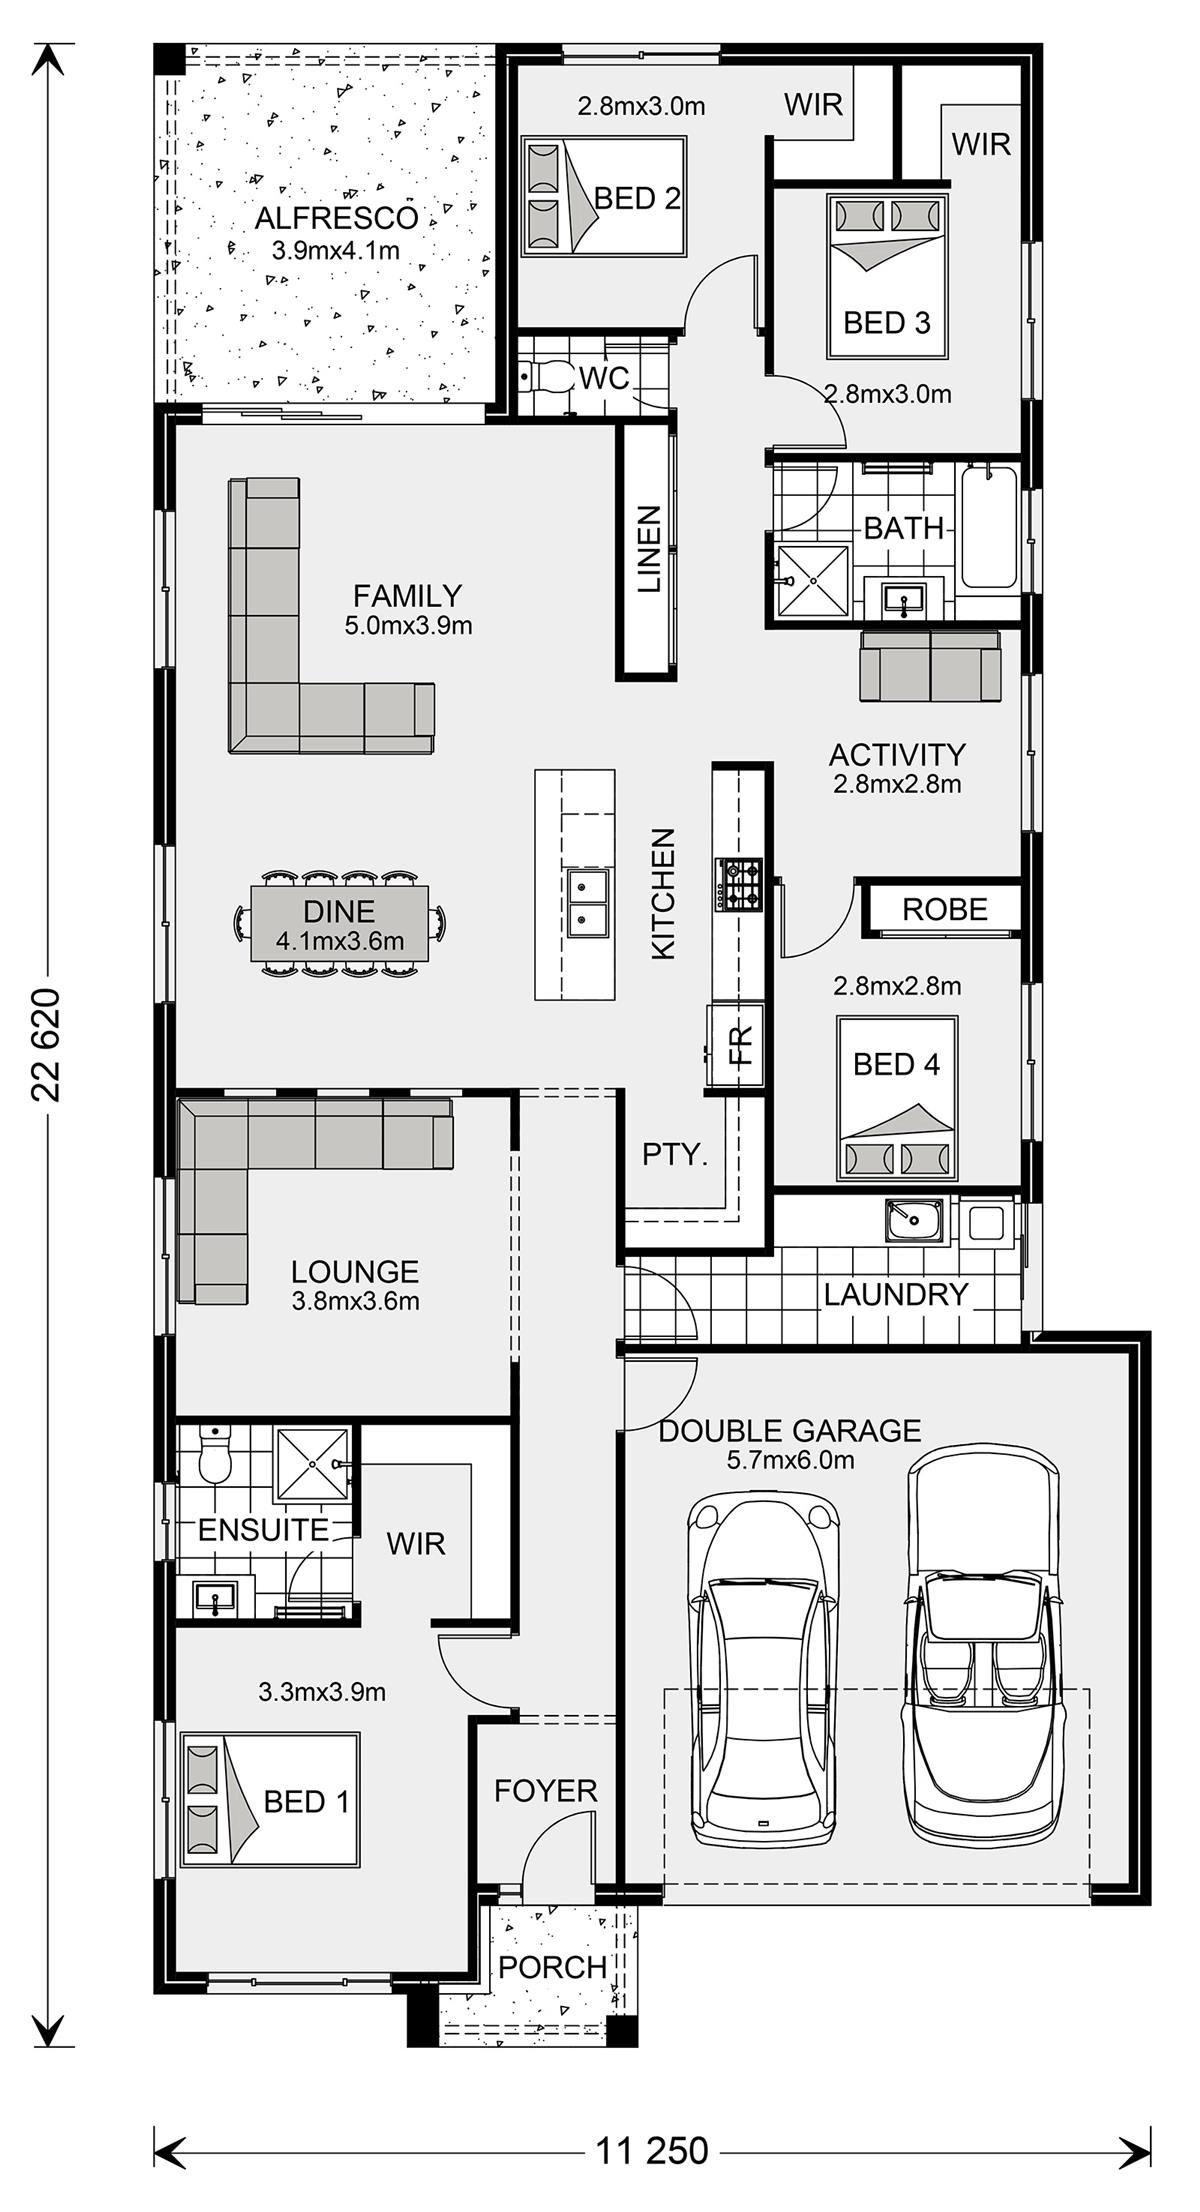 Bridgewater 225 Home Designs In Launceston G J Gardner Homes New House Plans Home Design Floor Plans Vintage House Plans